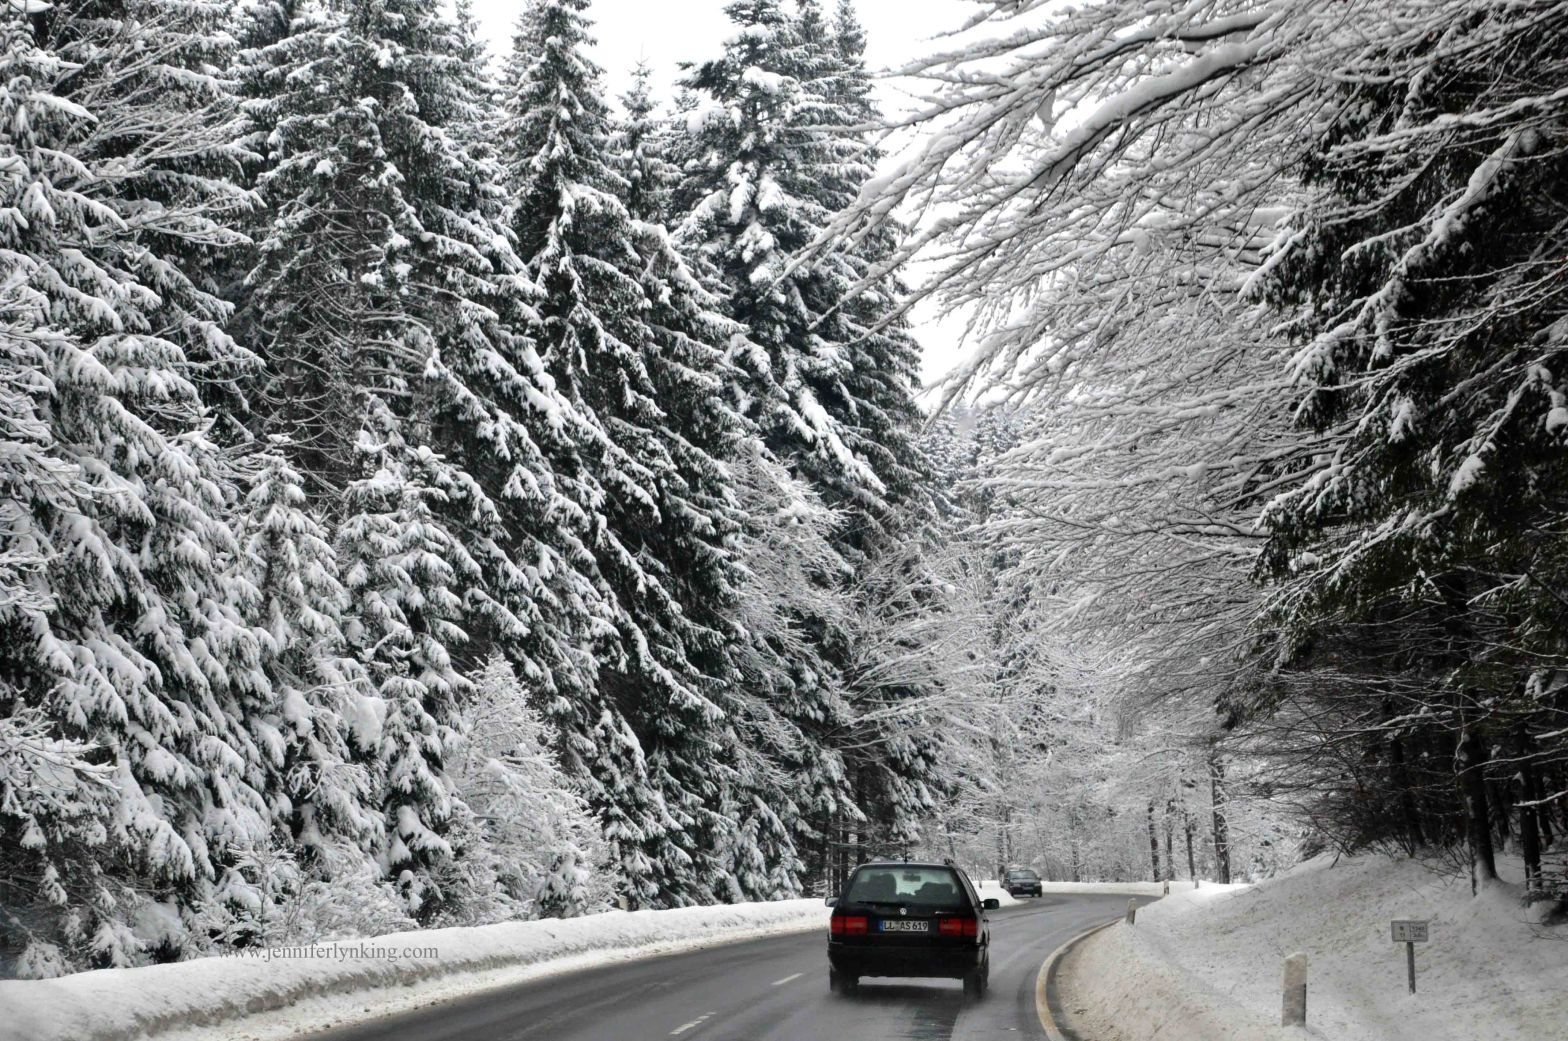 Winter Wonderland in Czech Republic Sumava